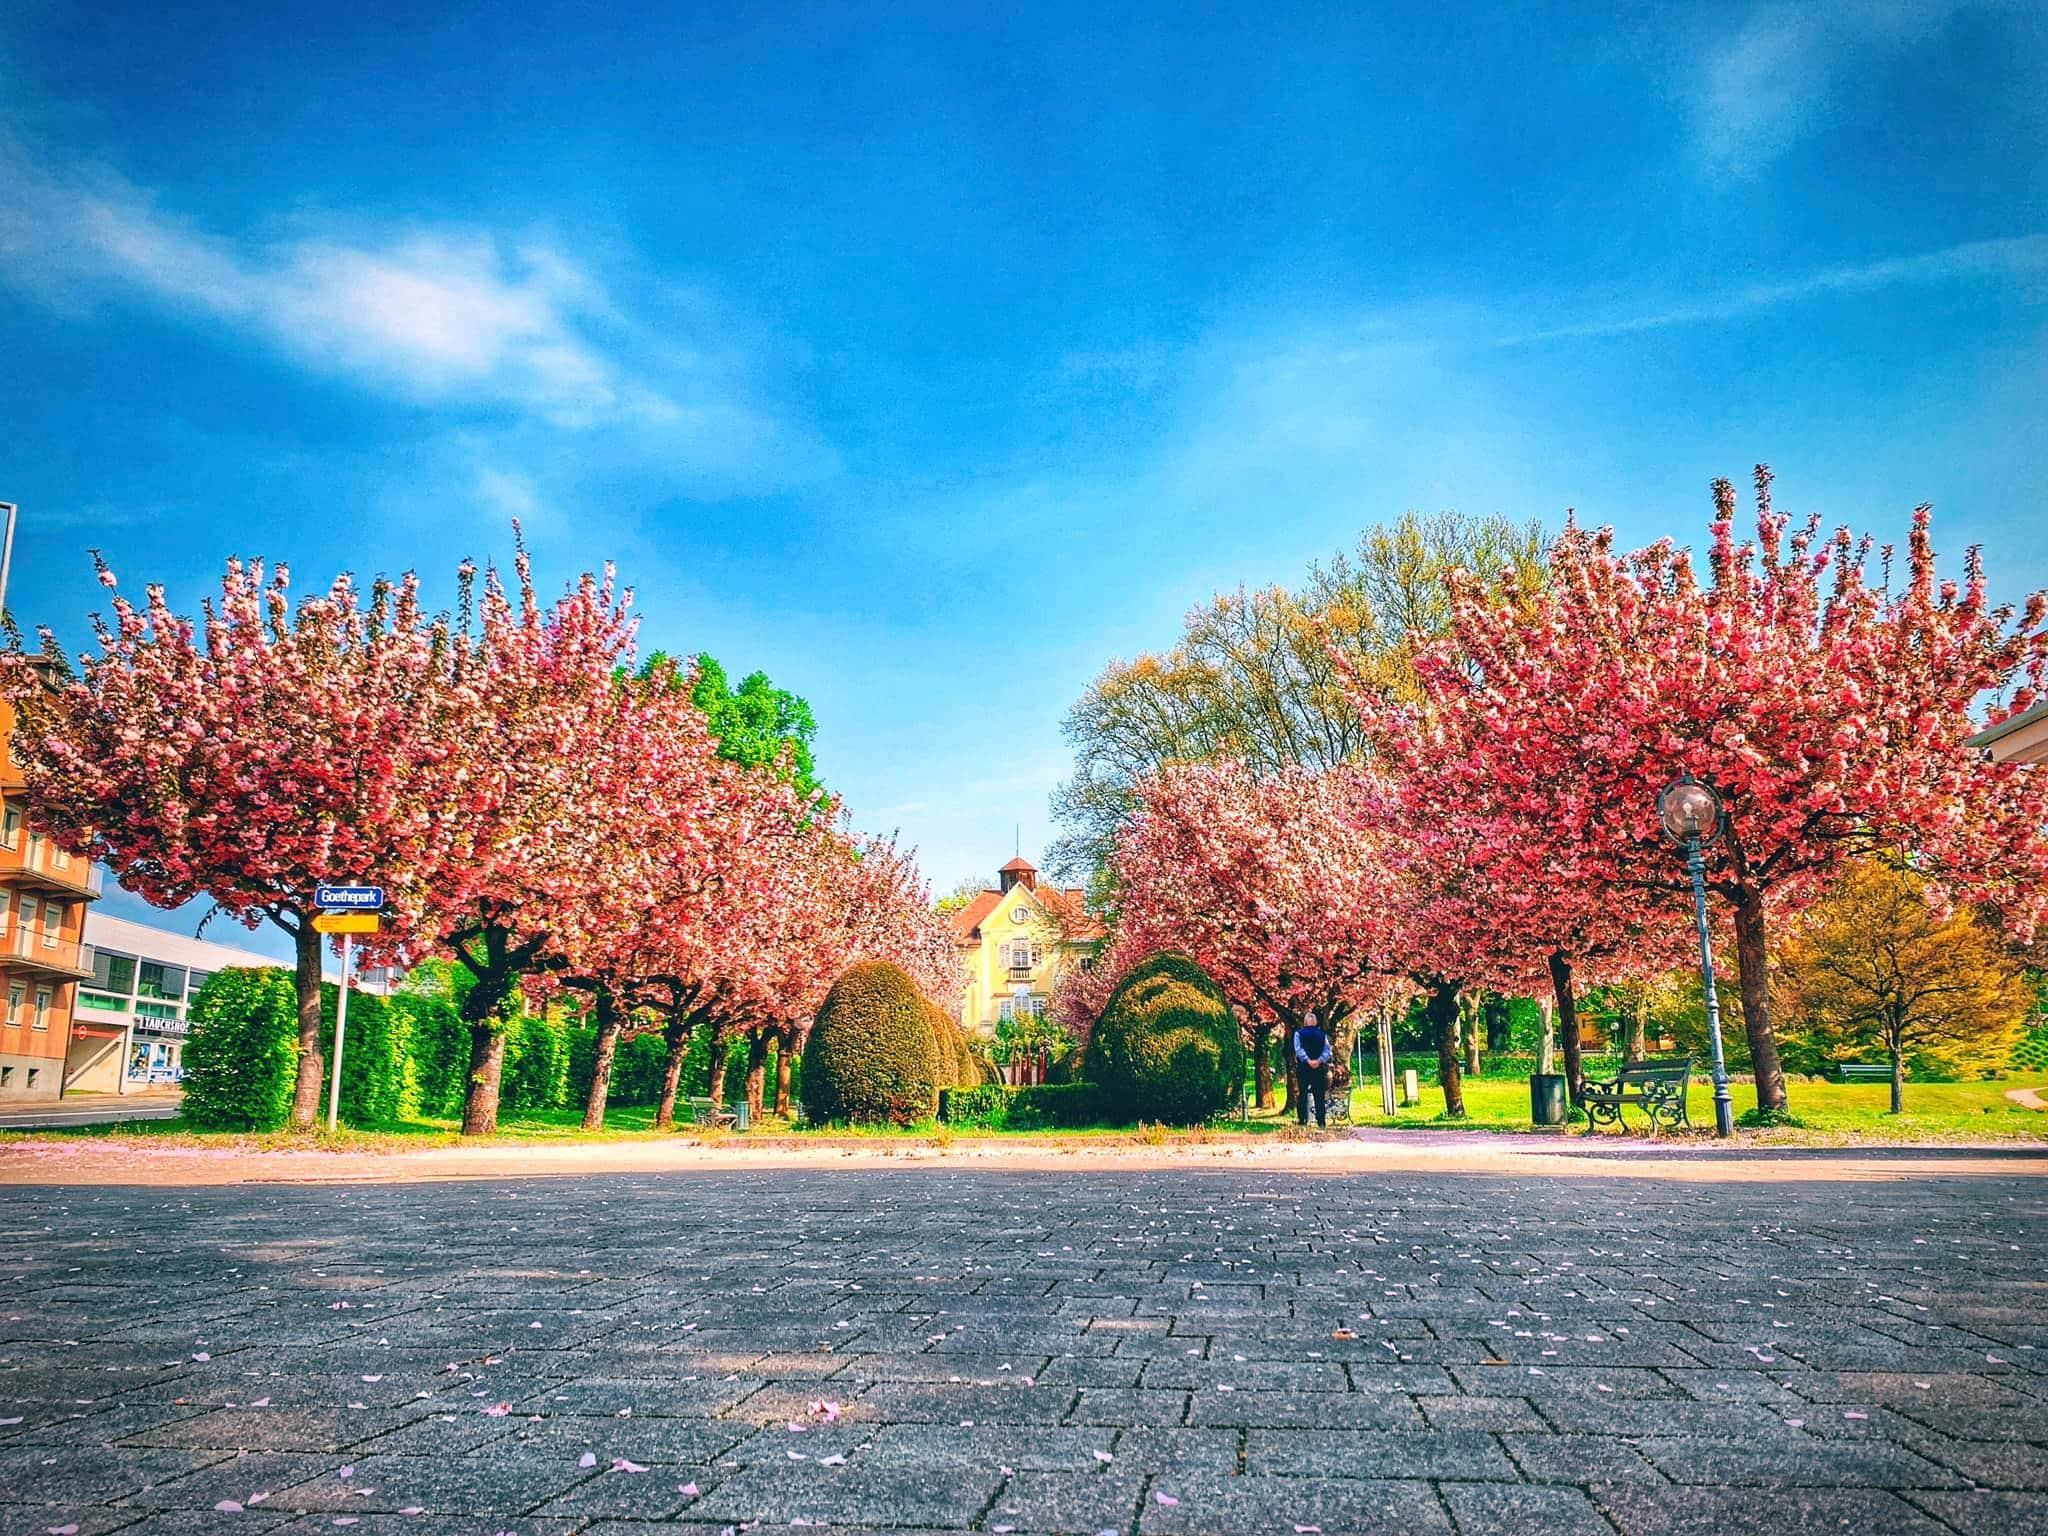 Goethepark, Kirschblüte, 9020 Klagenfurt am Wörthersee, Frühling, Blüten, rosa